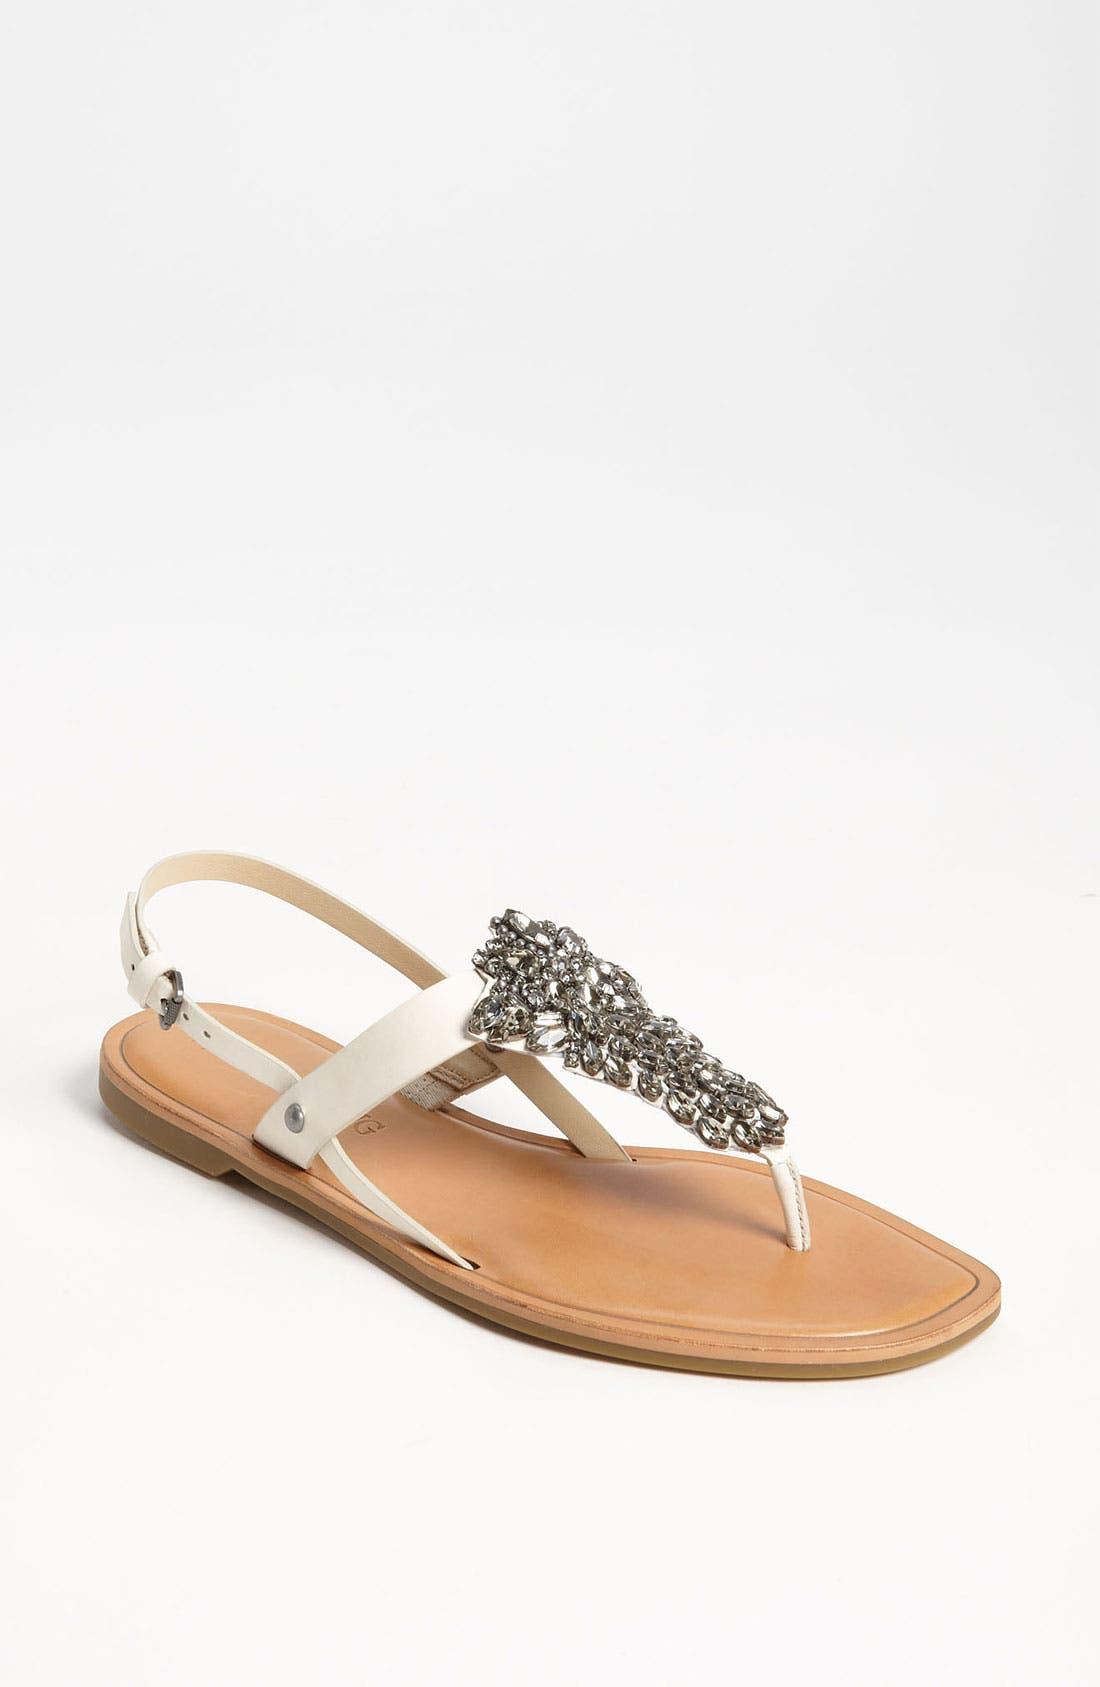 Alternate Image 1 Selected - Vera Wang Footwear 'Avy' Sandal (Online Only)